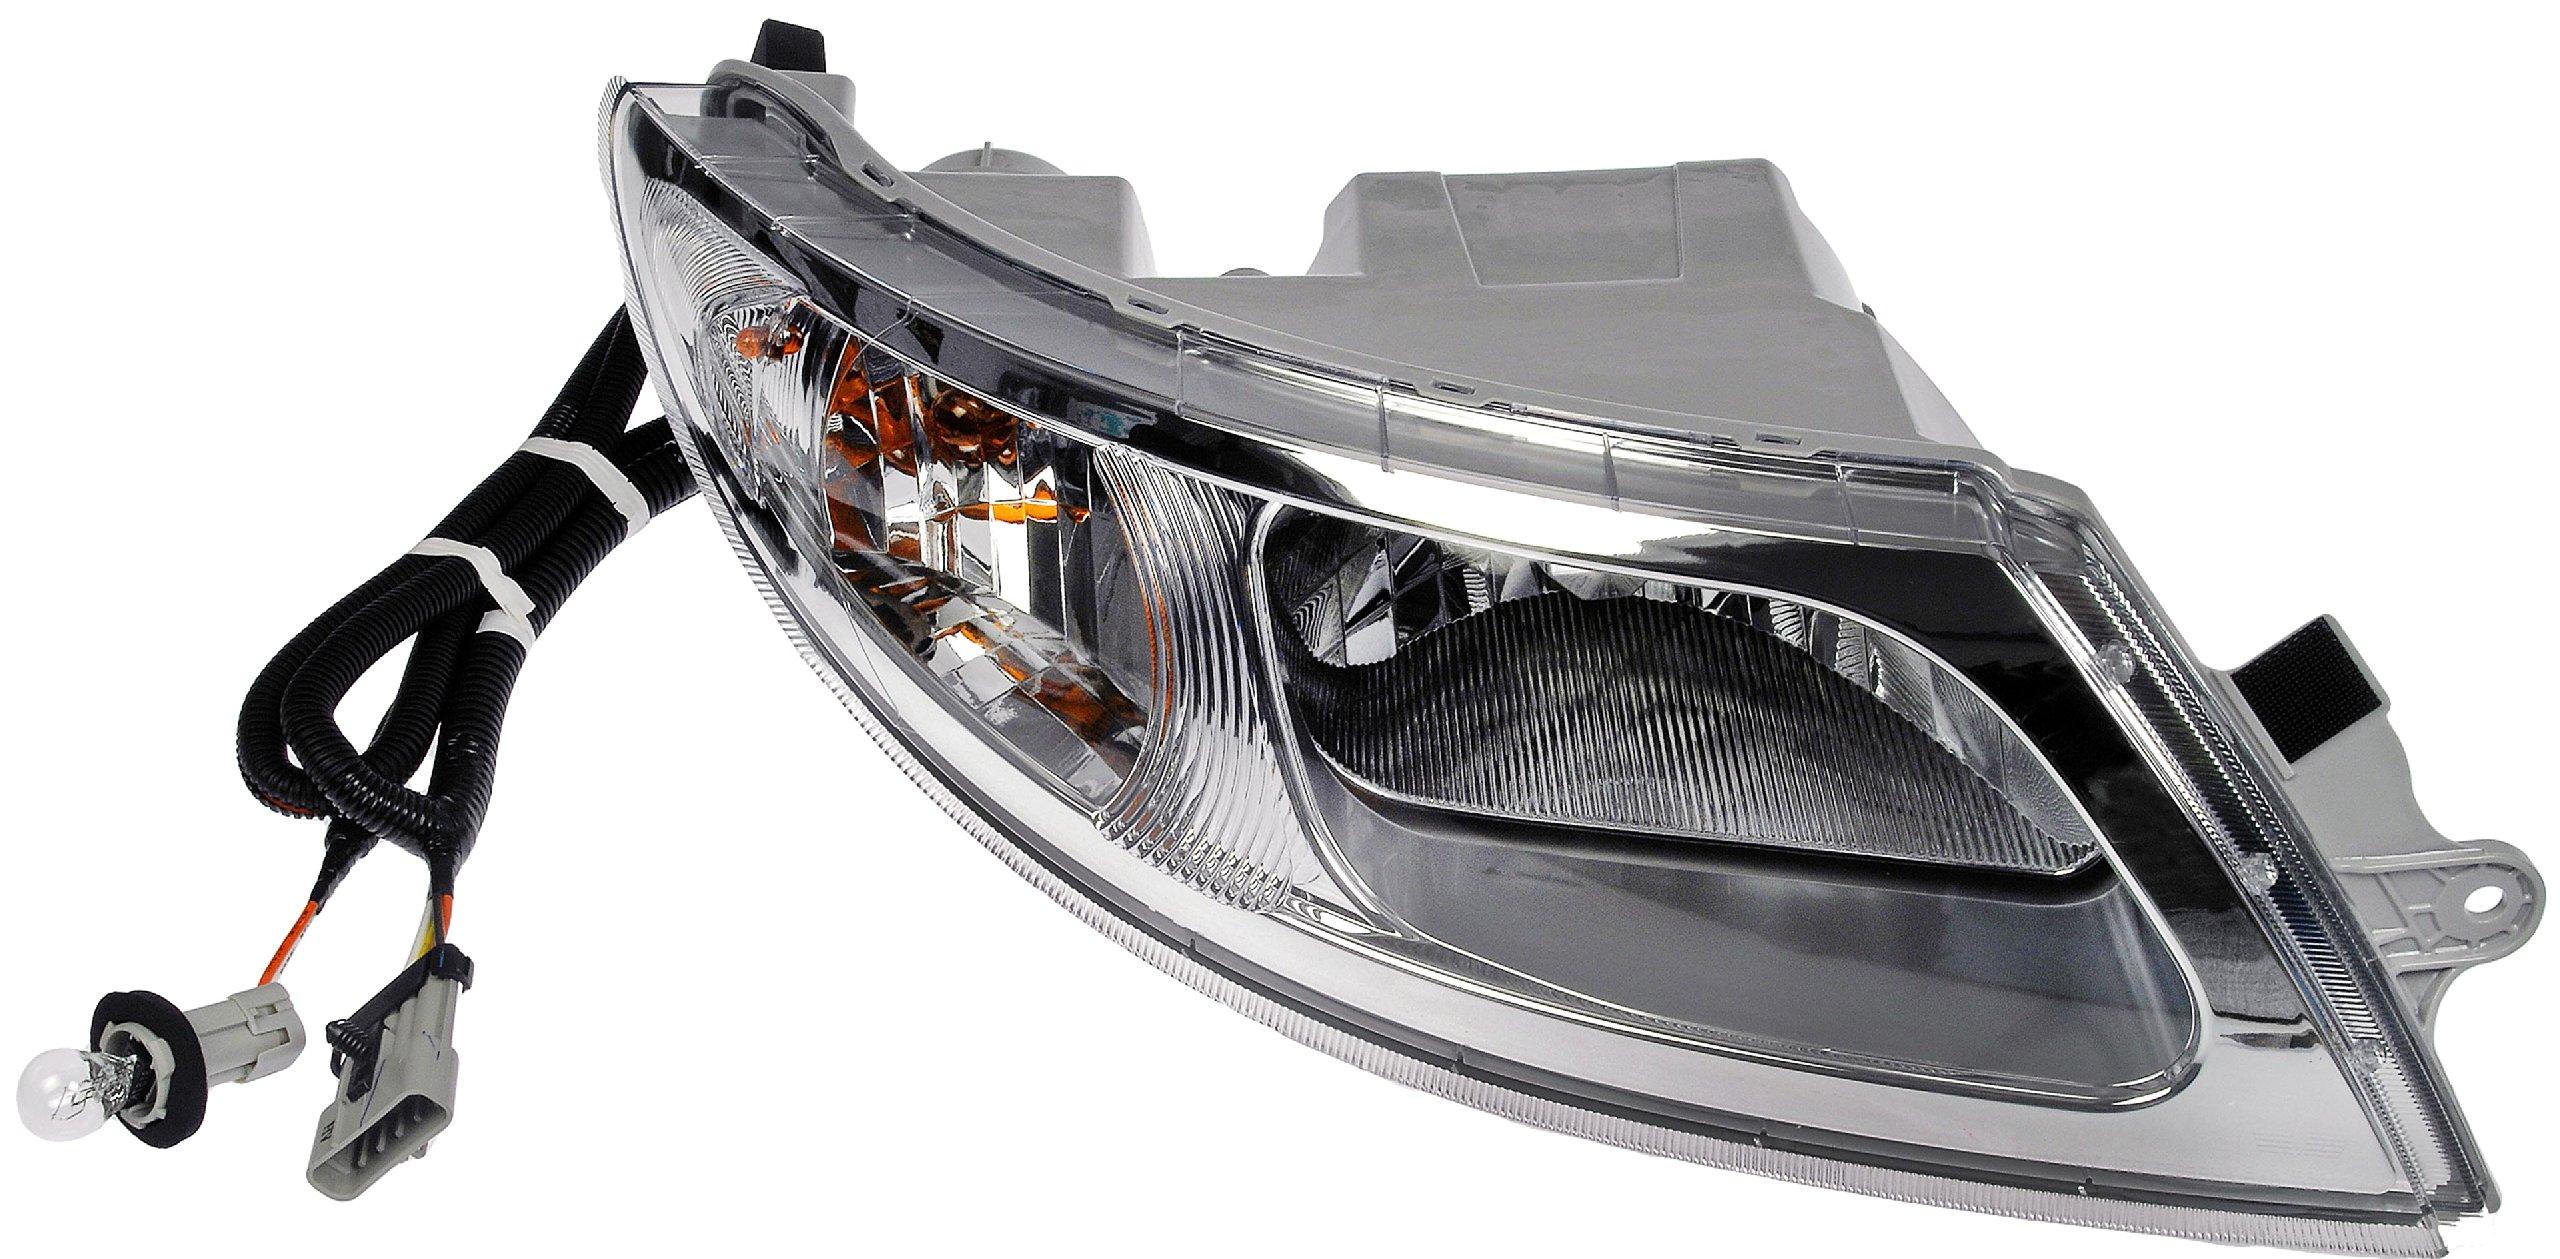 Dorman 888-5109 Passenger Side Headlight Assembly For Select IC/IC Corporation/International Models by Dorman